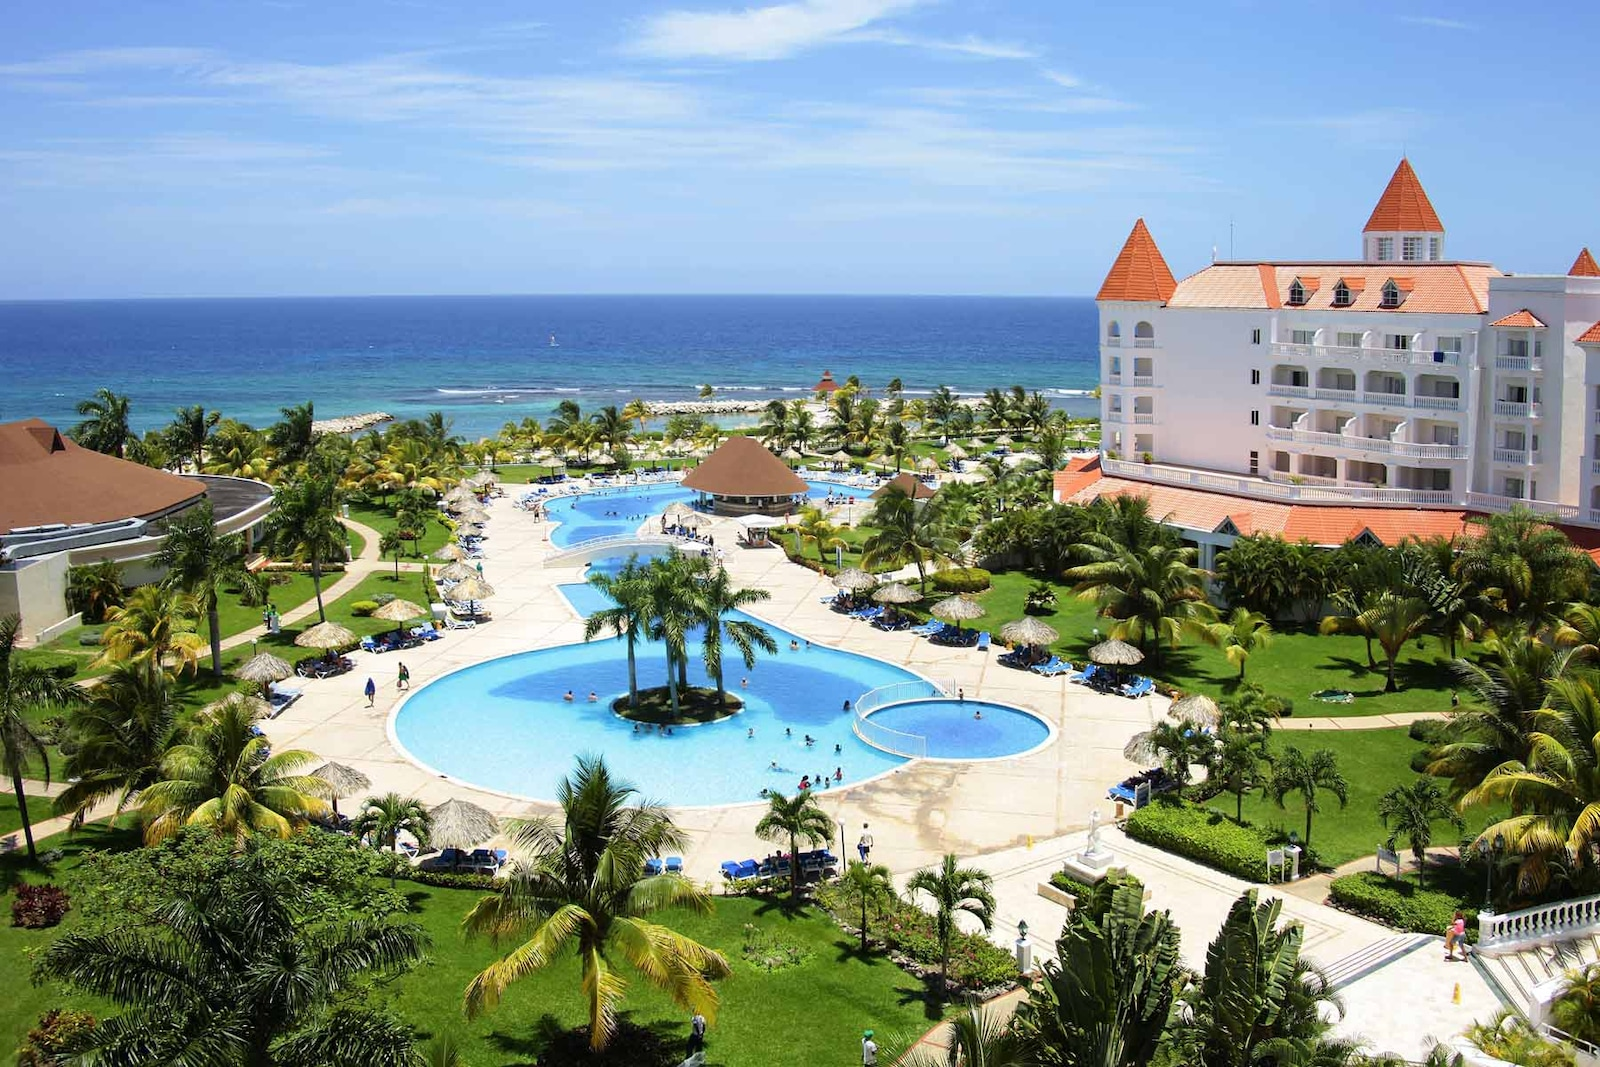 Grand bahia principe jamaica h tels bahia principe for Hotel luxury jamaica